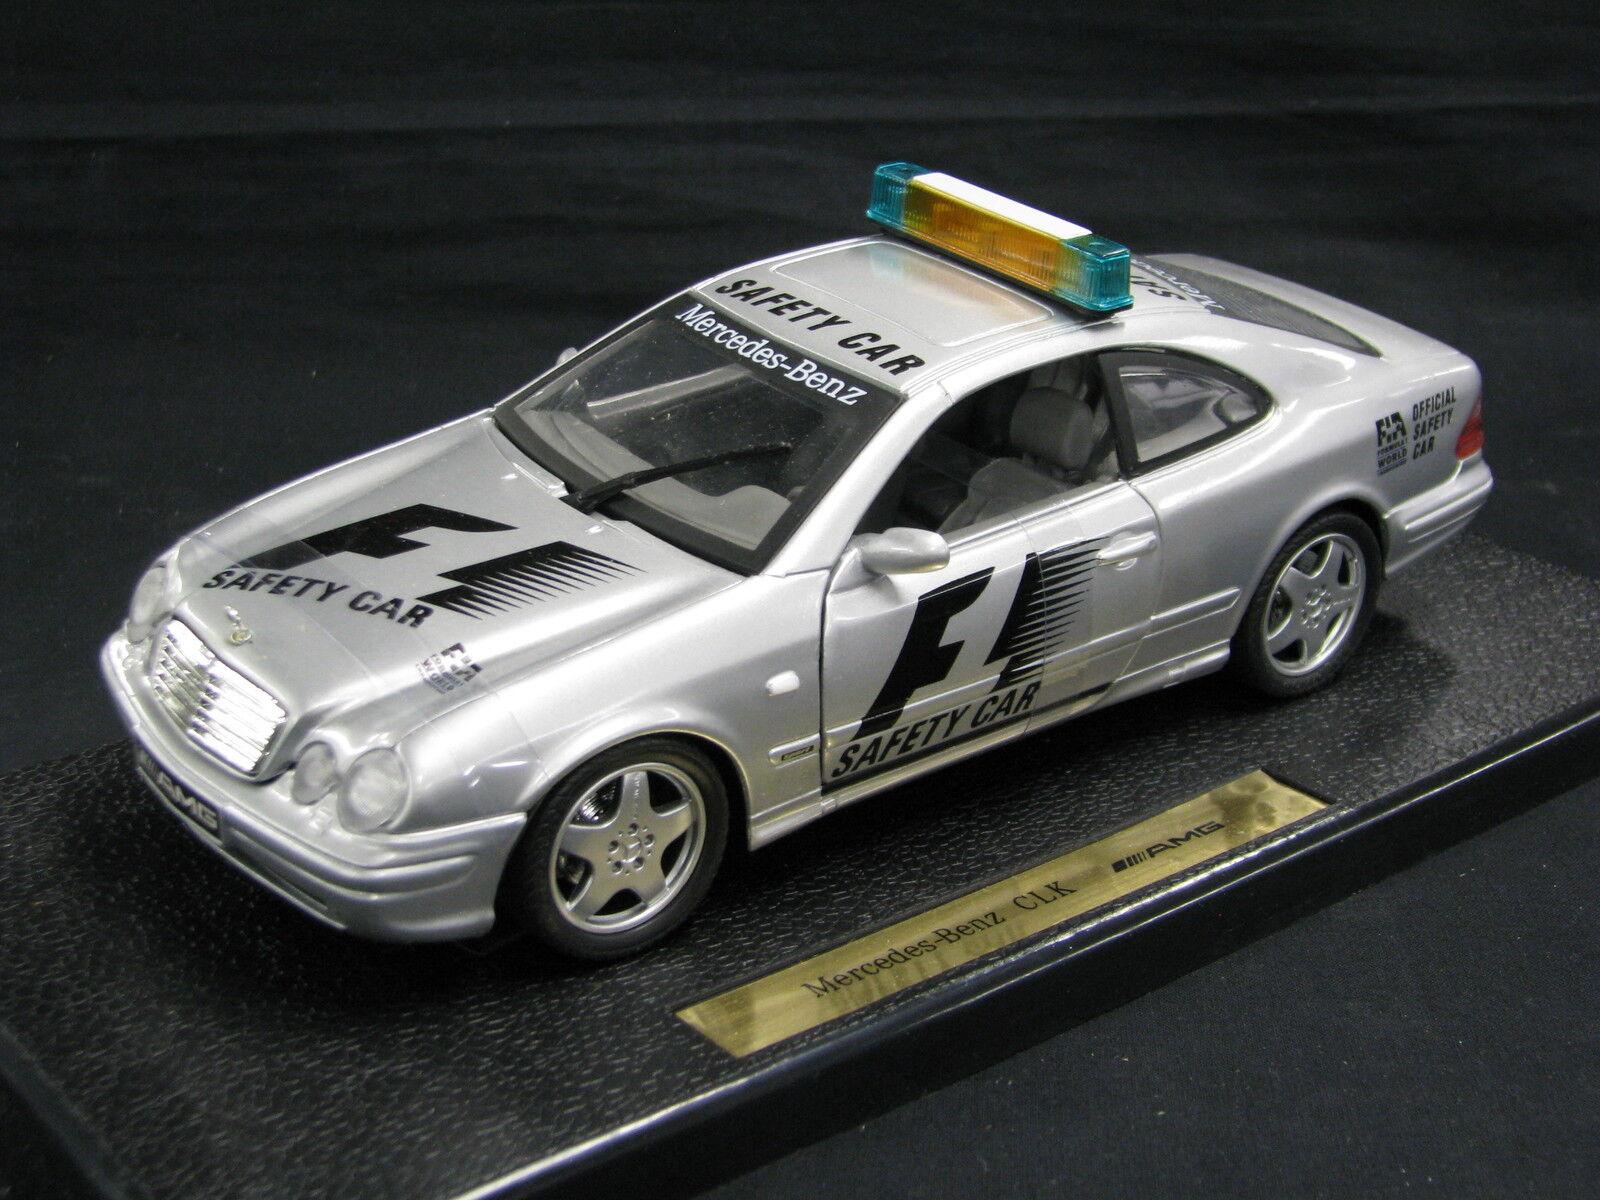 Anson Mercedes-Benz CLK AMG 1 18 Formula 1 Safety Car (JS)